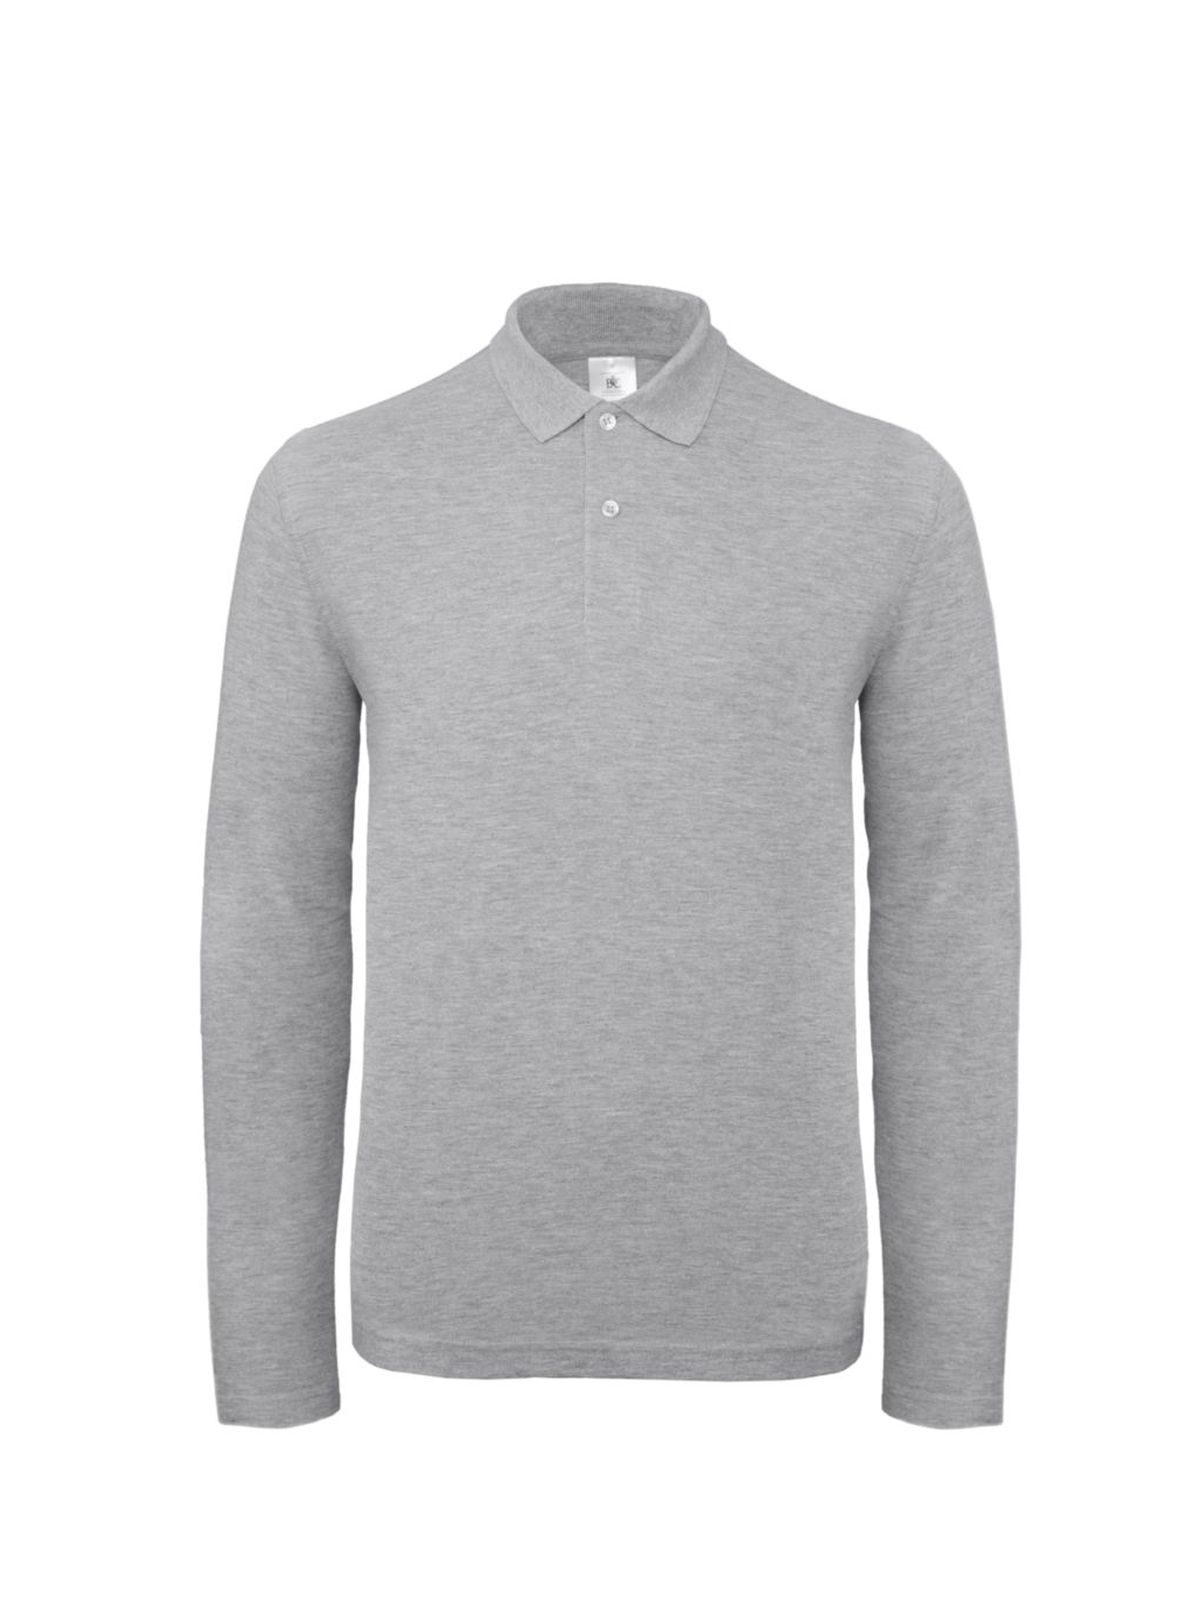 HG610   heather grey